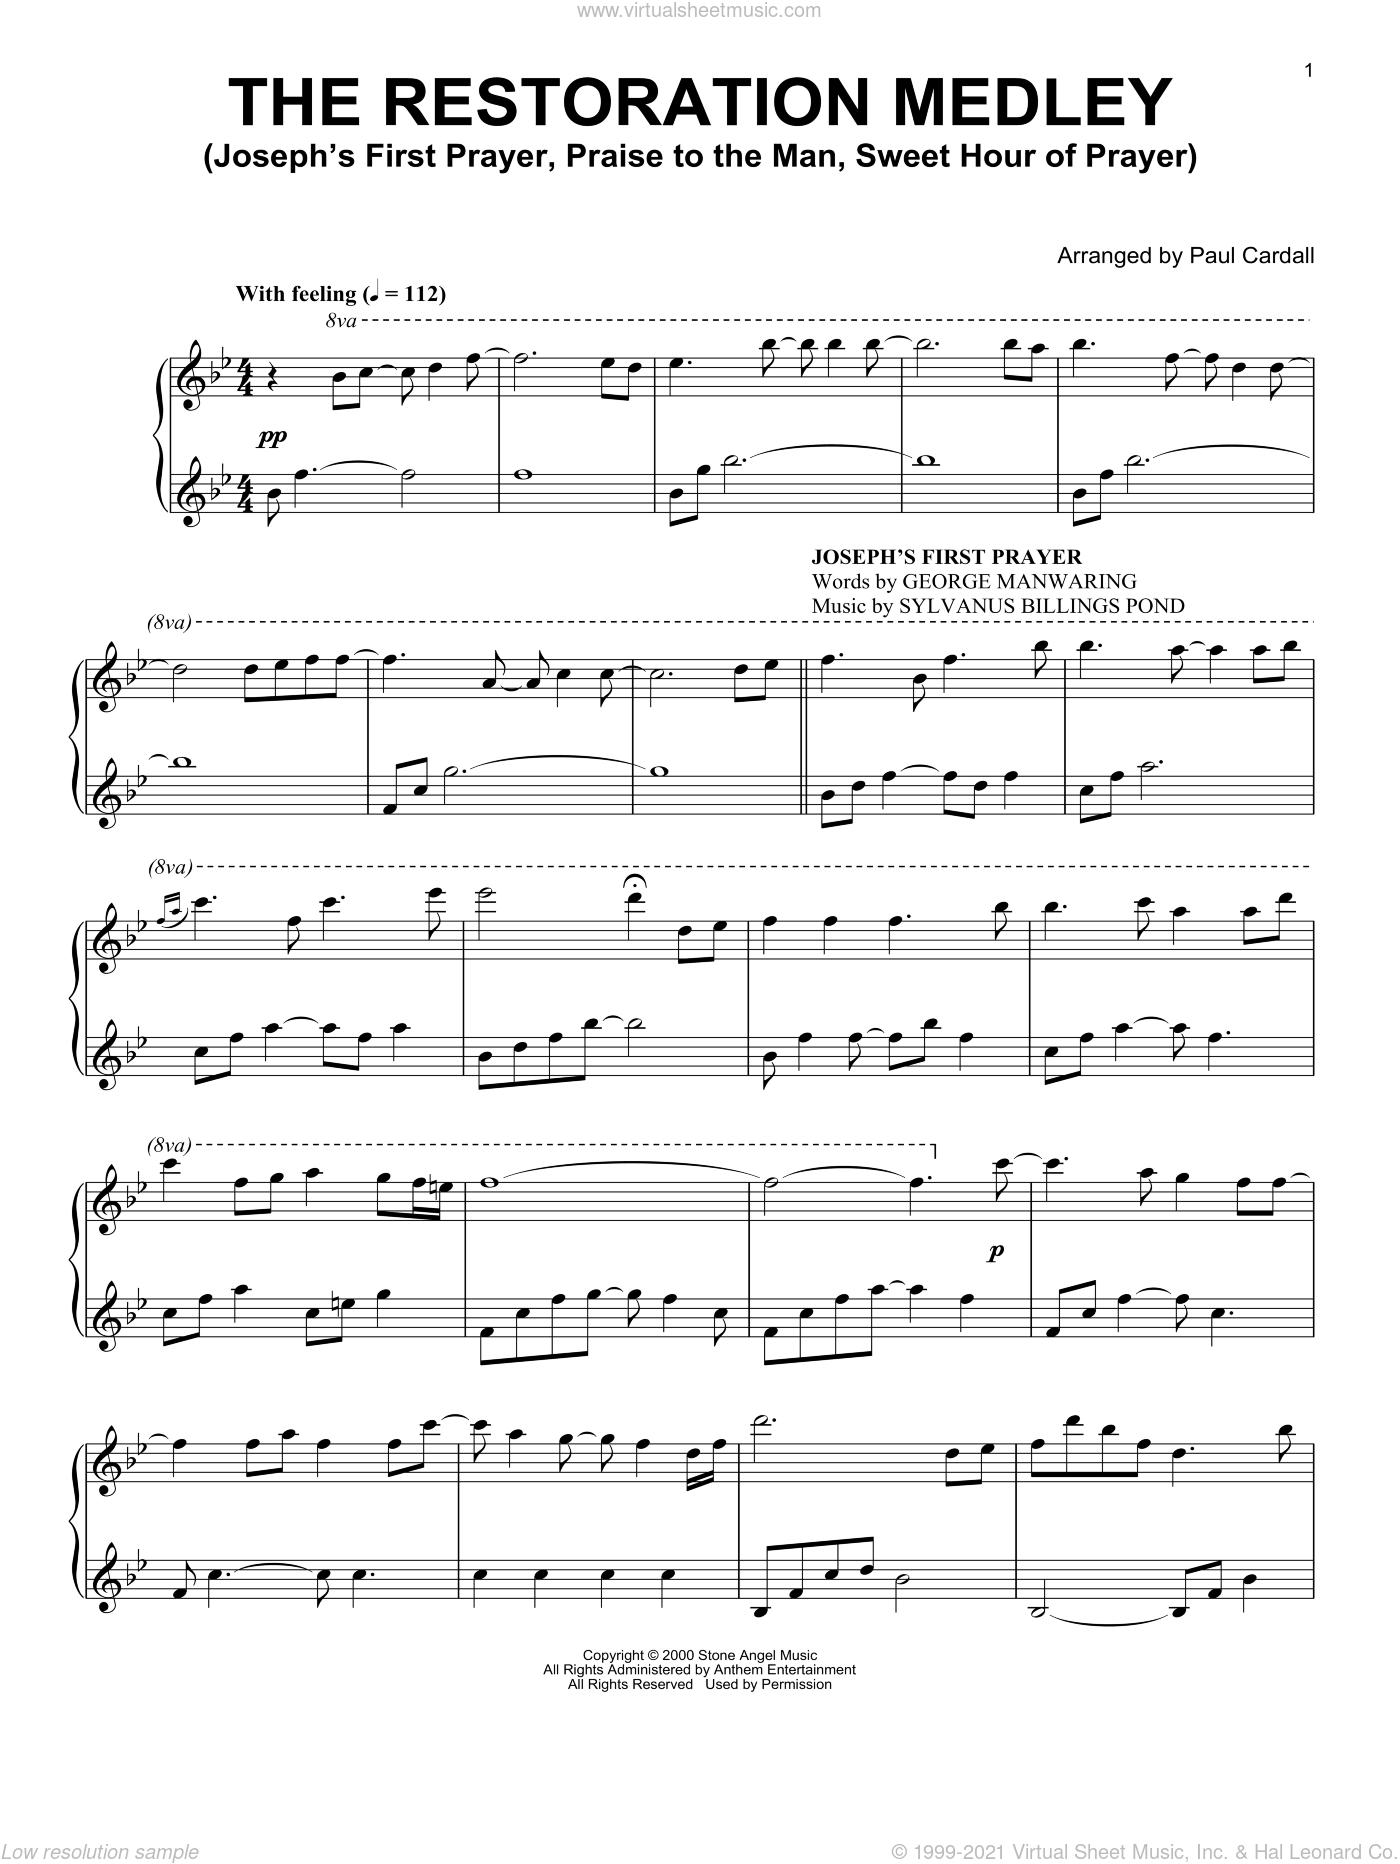 The Restoration Medley (Joseph's First Prayer, Praise To The Man, Sweet Hour Of Prayer) sheet music for piano solo by William B. Bradbury, Paul Cardall, Scottish Folk Song and Sylvanus Billings Pond, intermediate skill level